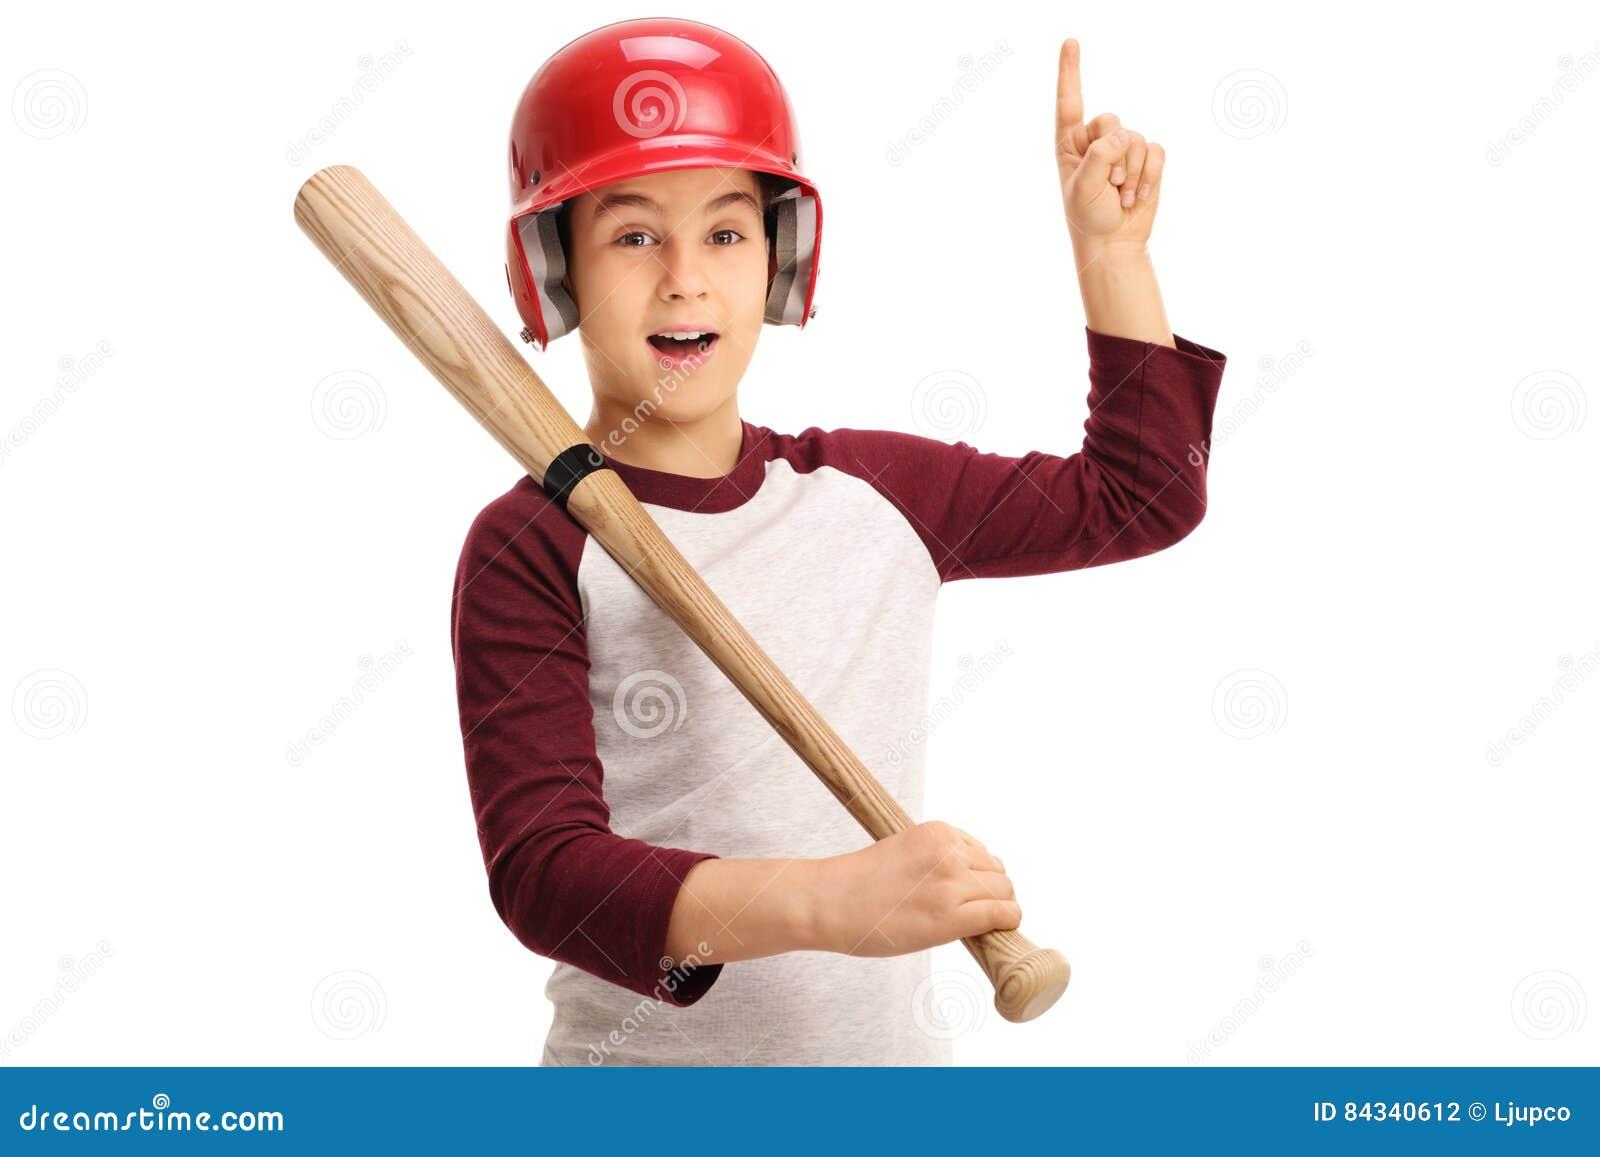 joyful kid with baseball equipment pointing up stock photo image